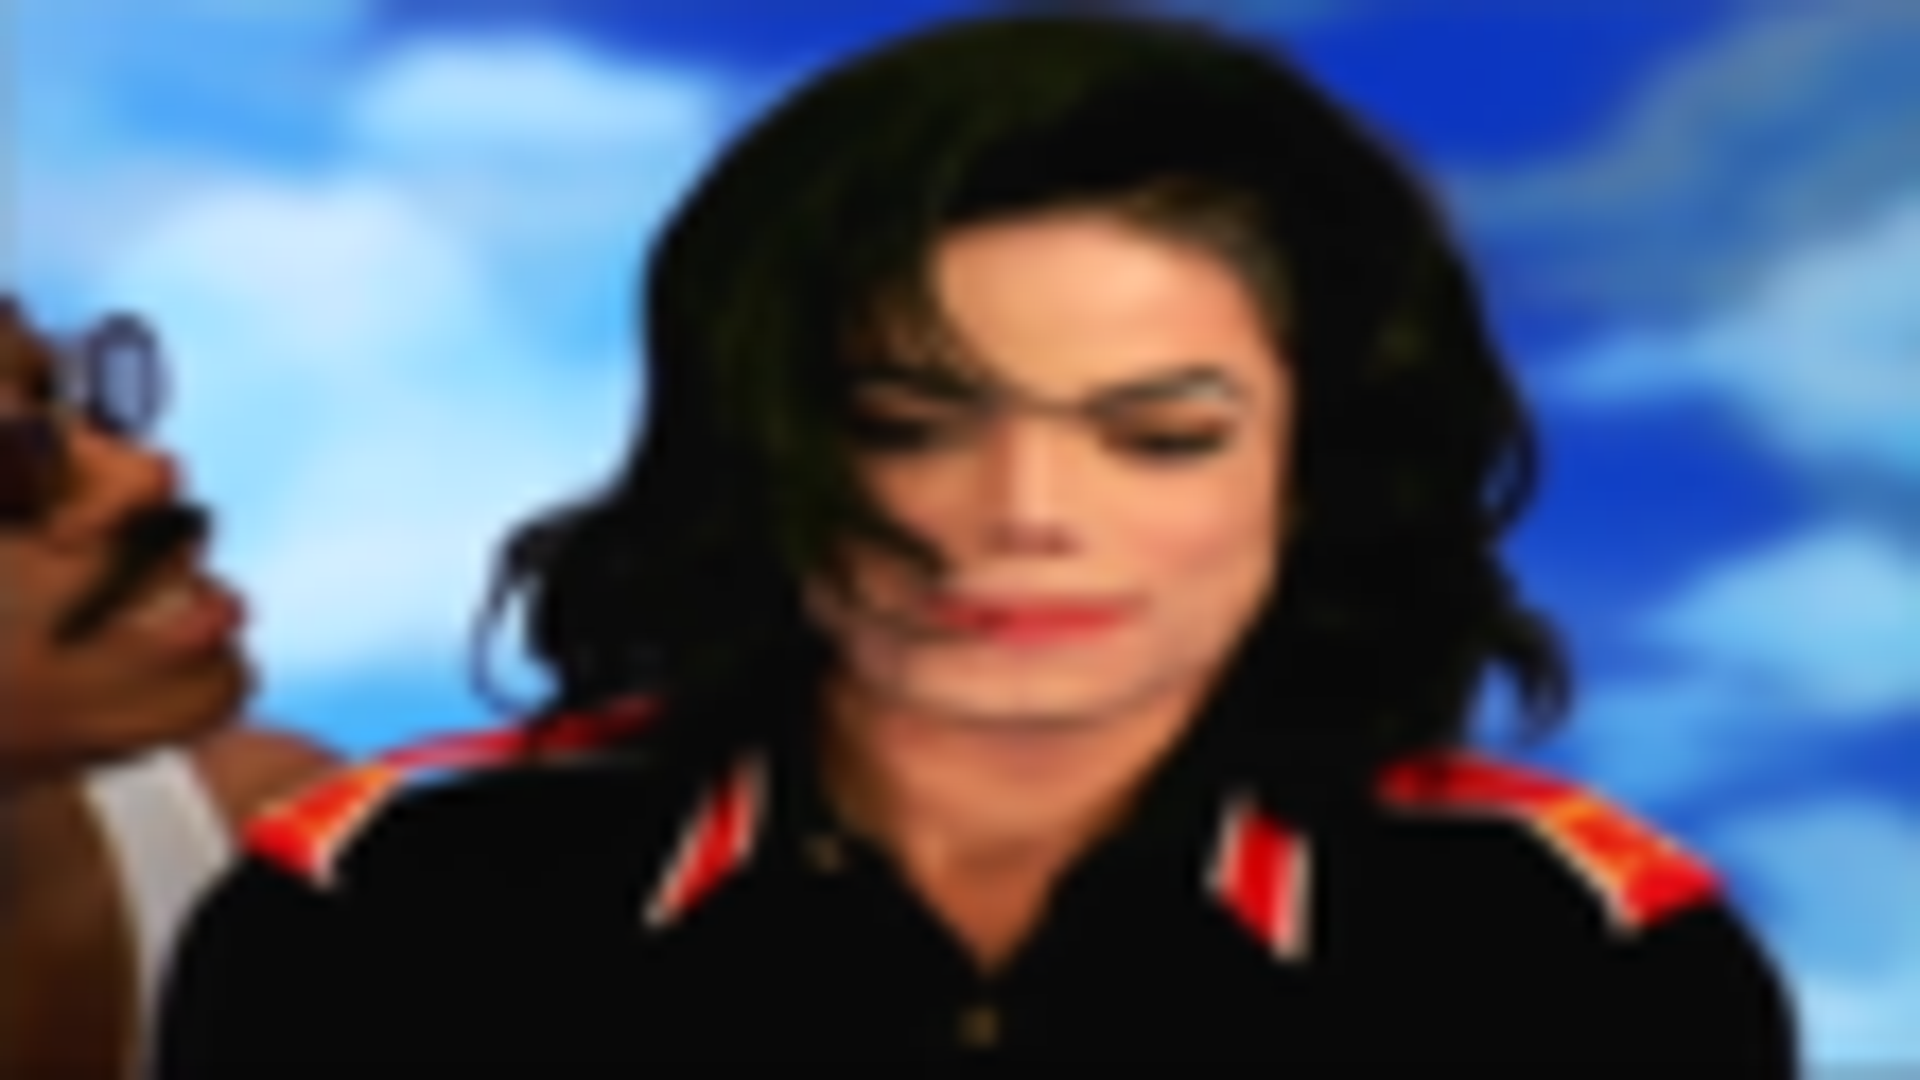 1080p画质增强- Whatzupwitu - MJ-艾迪·墨菲